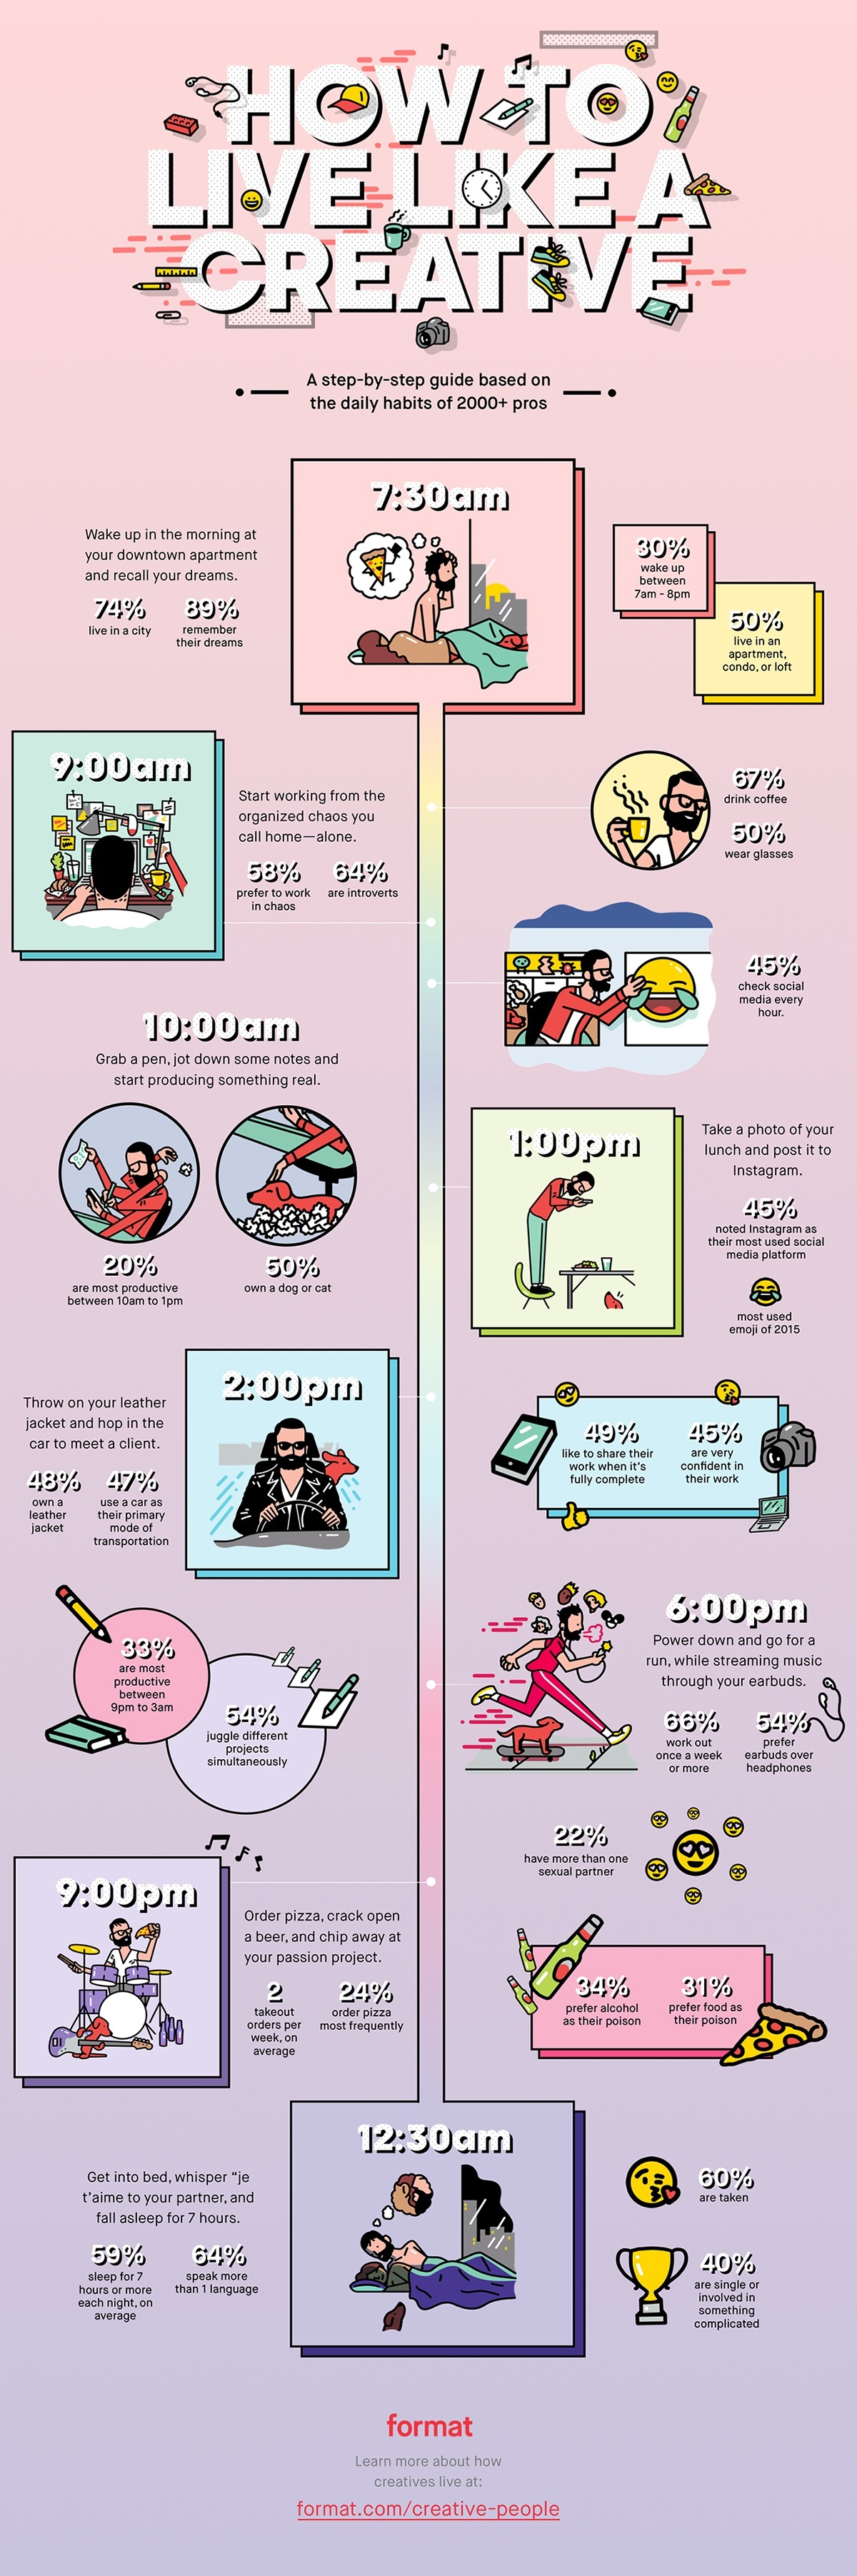 BI_160208_how-to-live-like-a-creative-infographic